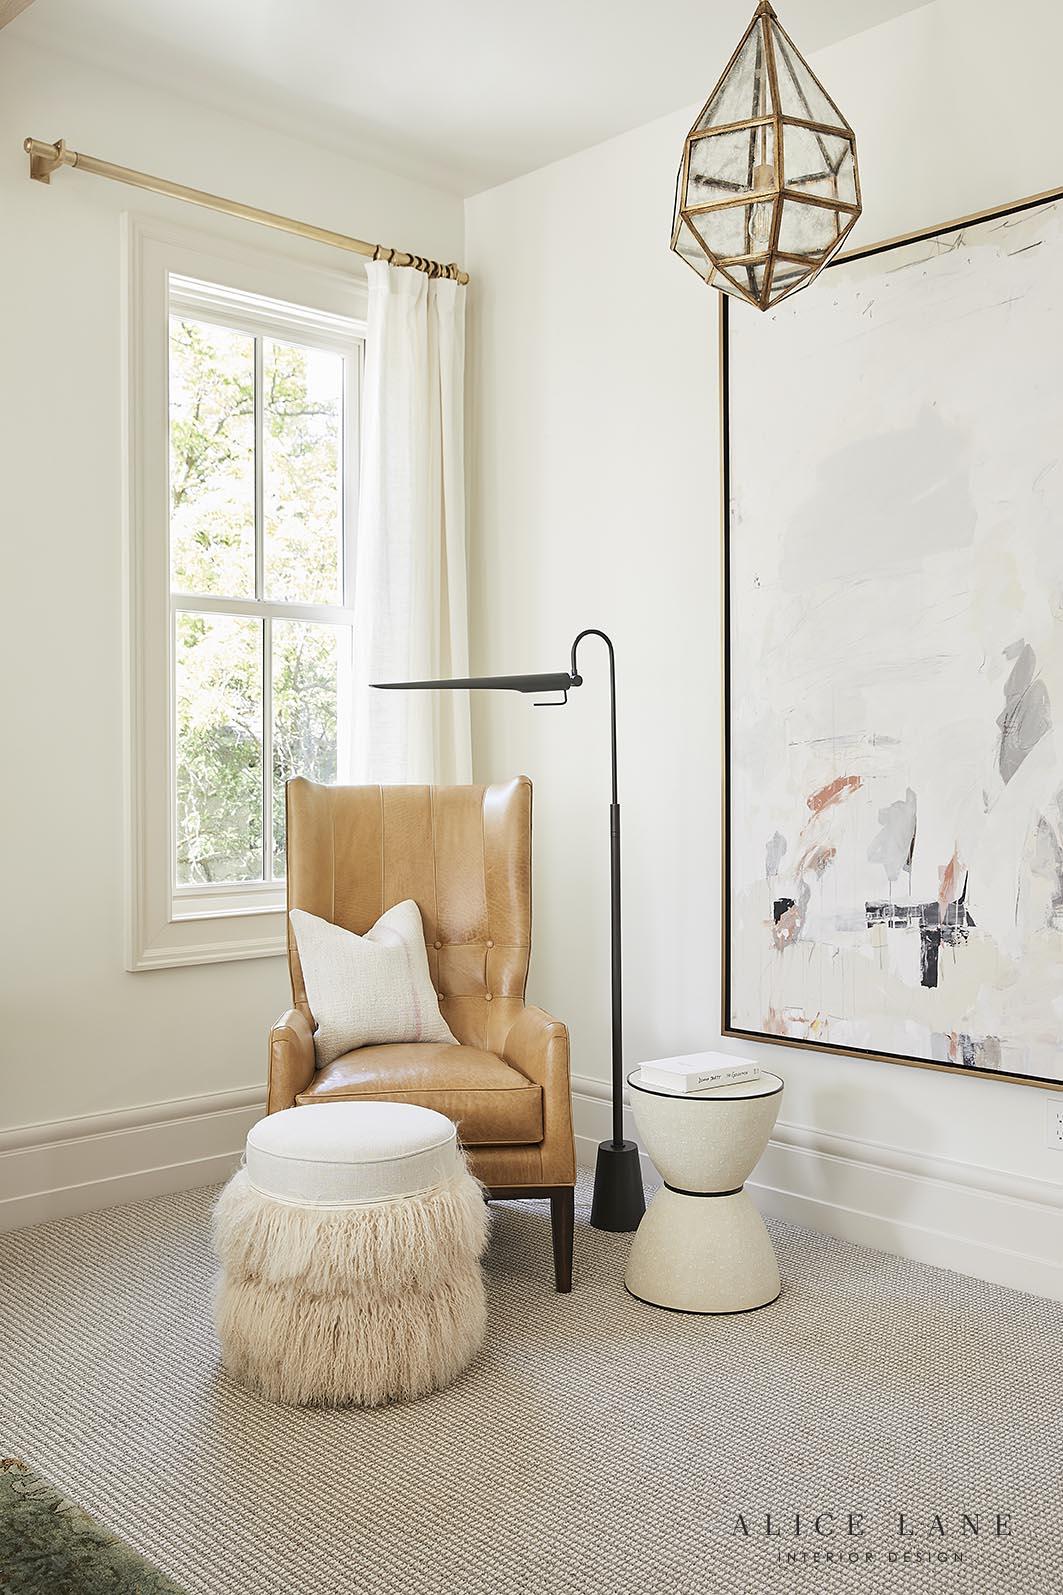 Tiger Oak   Alice Lane Interior Design   Photo by Nicole Gerulat